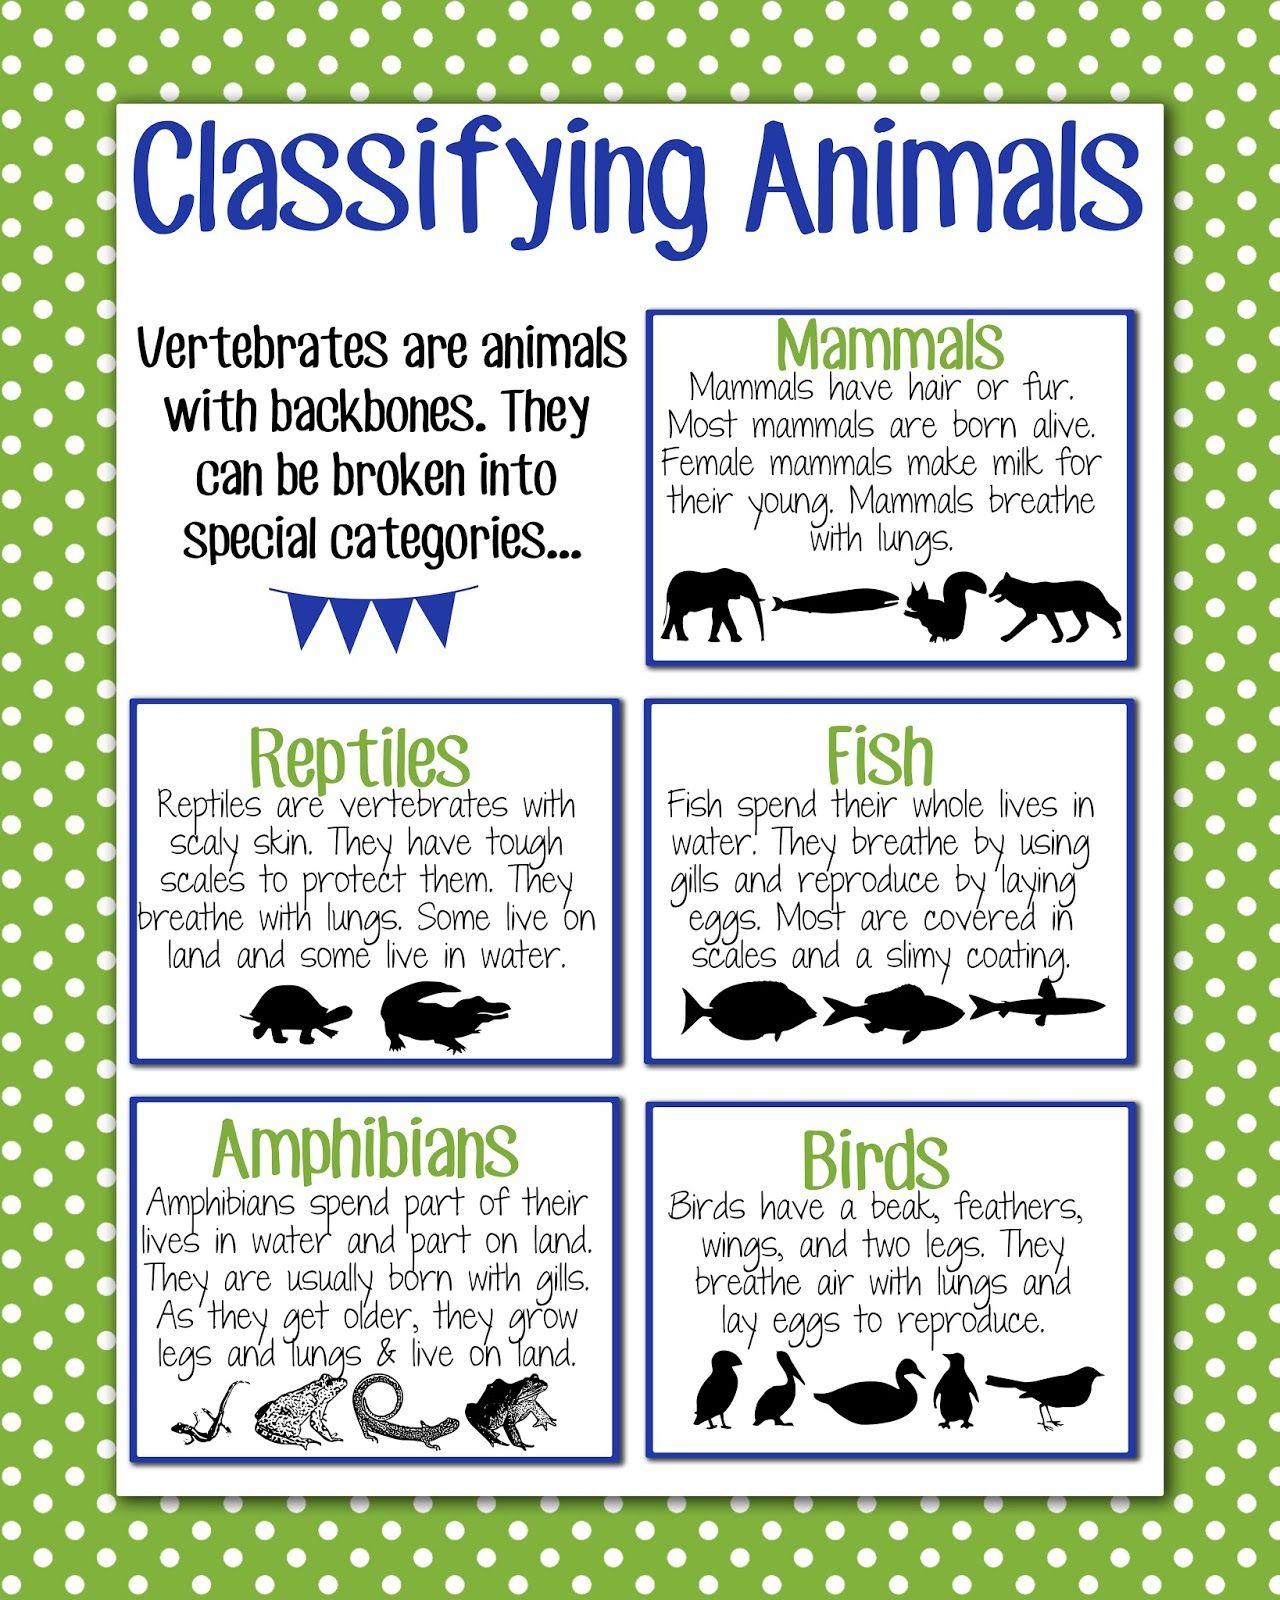 Anchor Chart Classifying Animals 1 280 1 600 Pixels